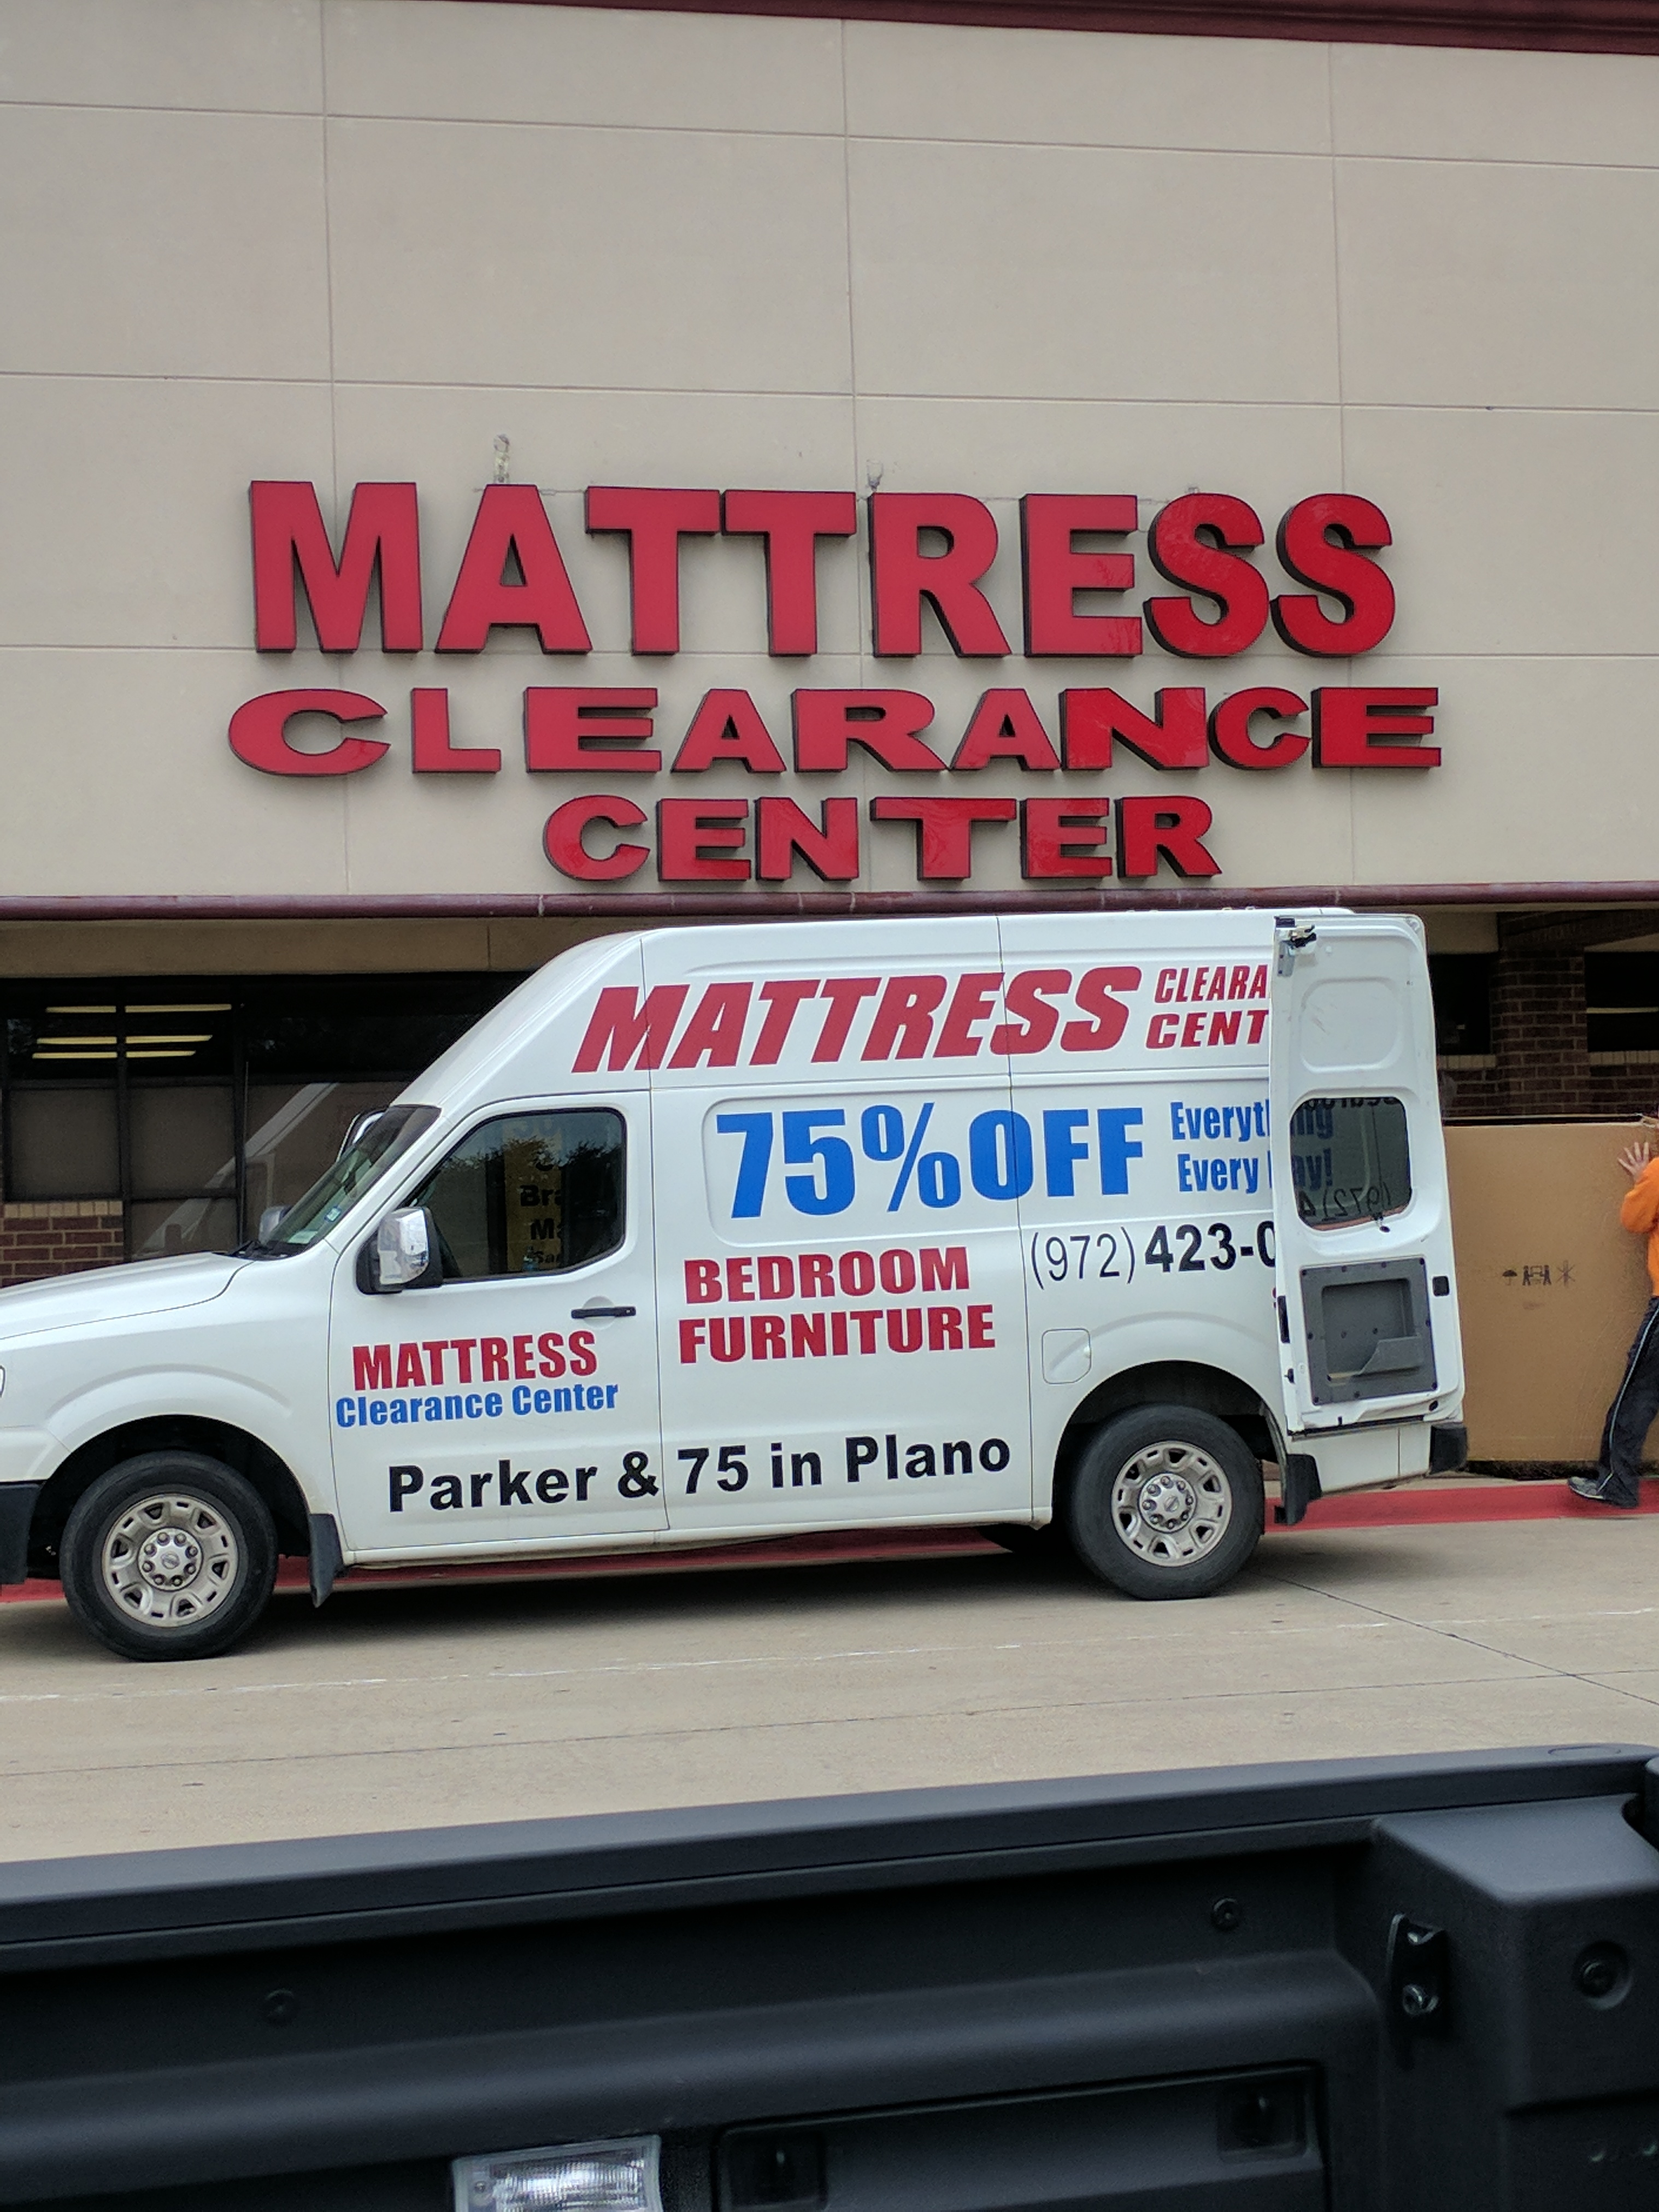 Mattress Clearance Outlet - Dallas, TX 75231 - (469)776-5788 | ShowMeLocal.com